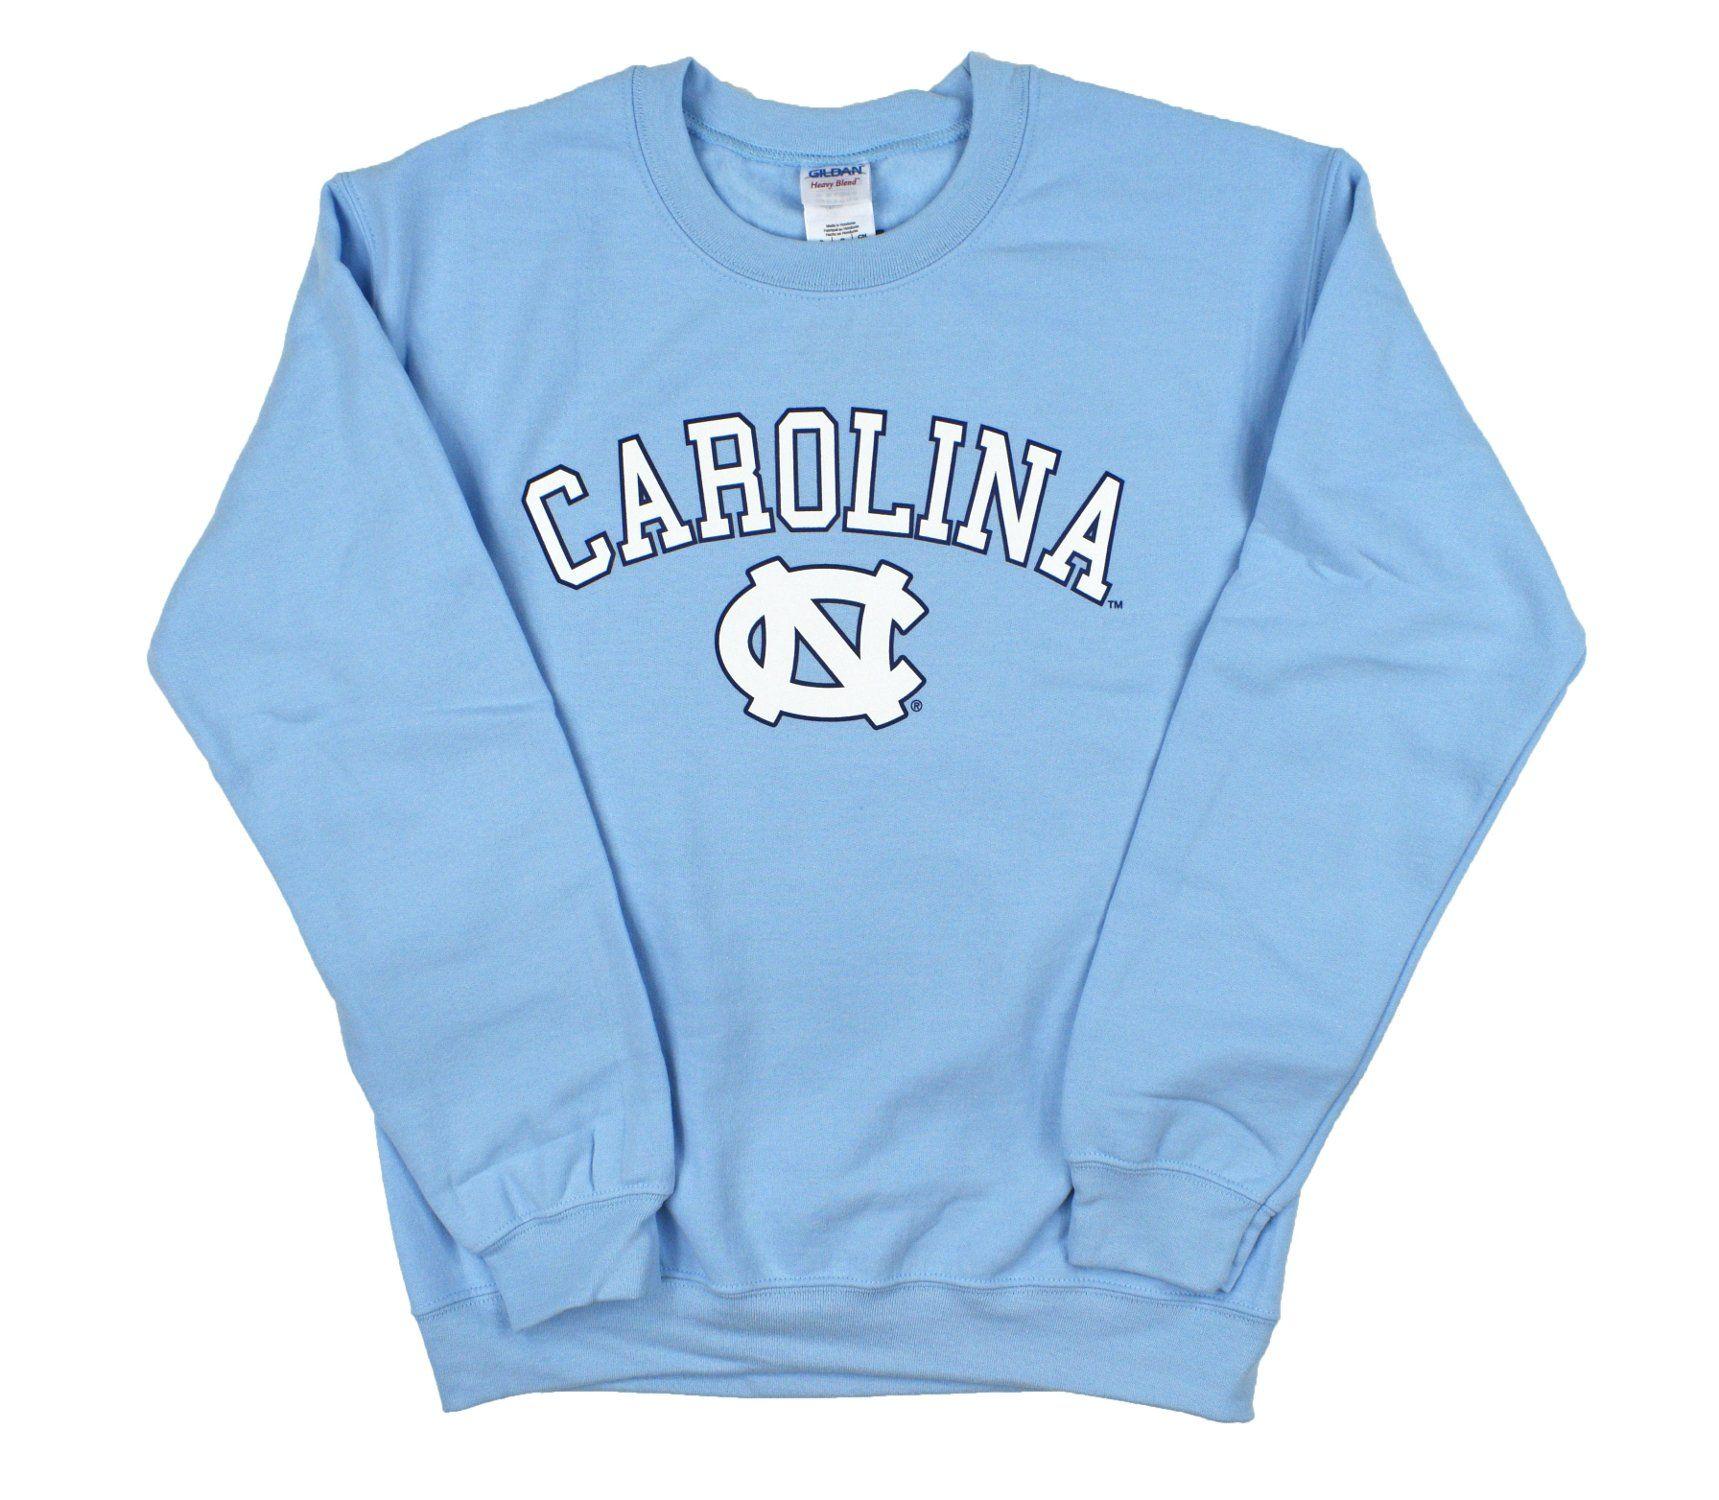 Carolina Blue Unc Crewneck Sweatshirt By Champion Sweatshirts College Sweatshirt Outfit Crew Neck Sweatshirt [ 1500 x 1719 Pixel ]